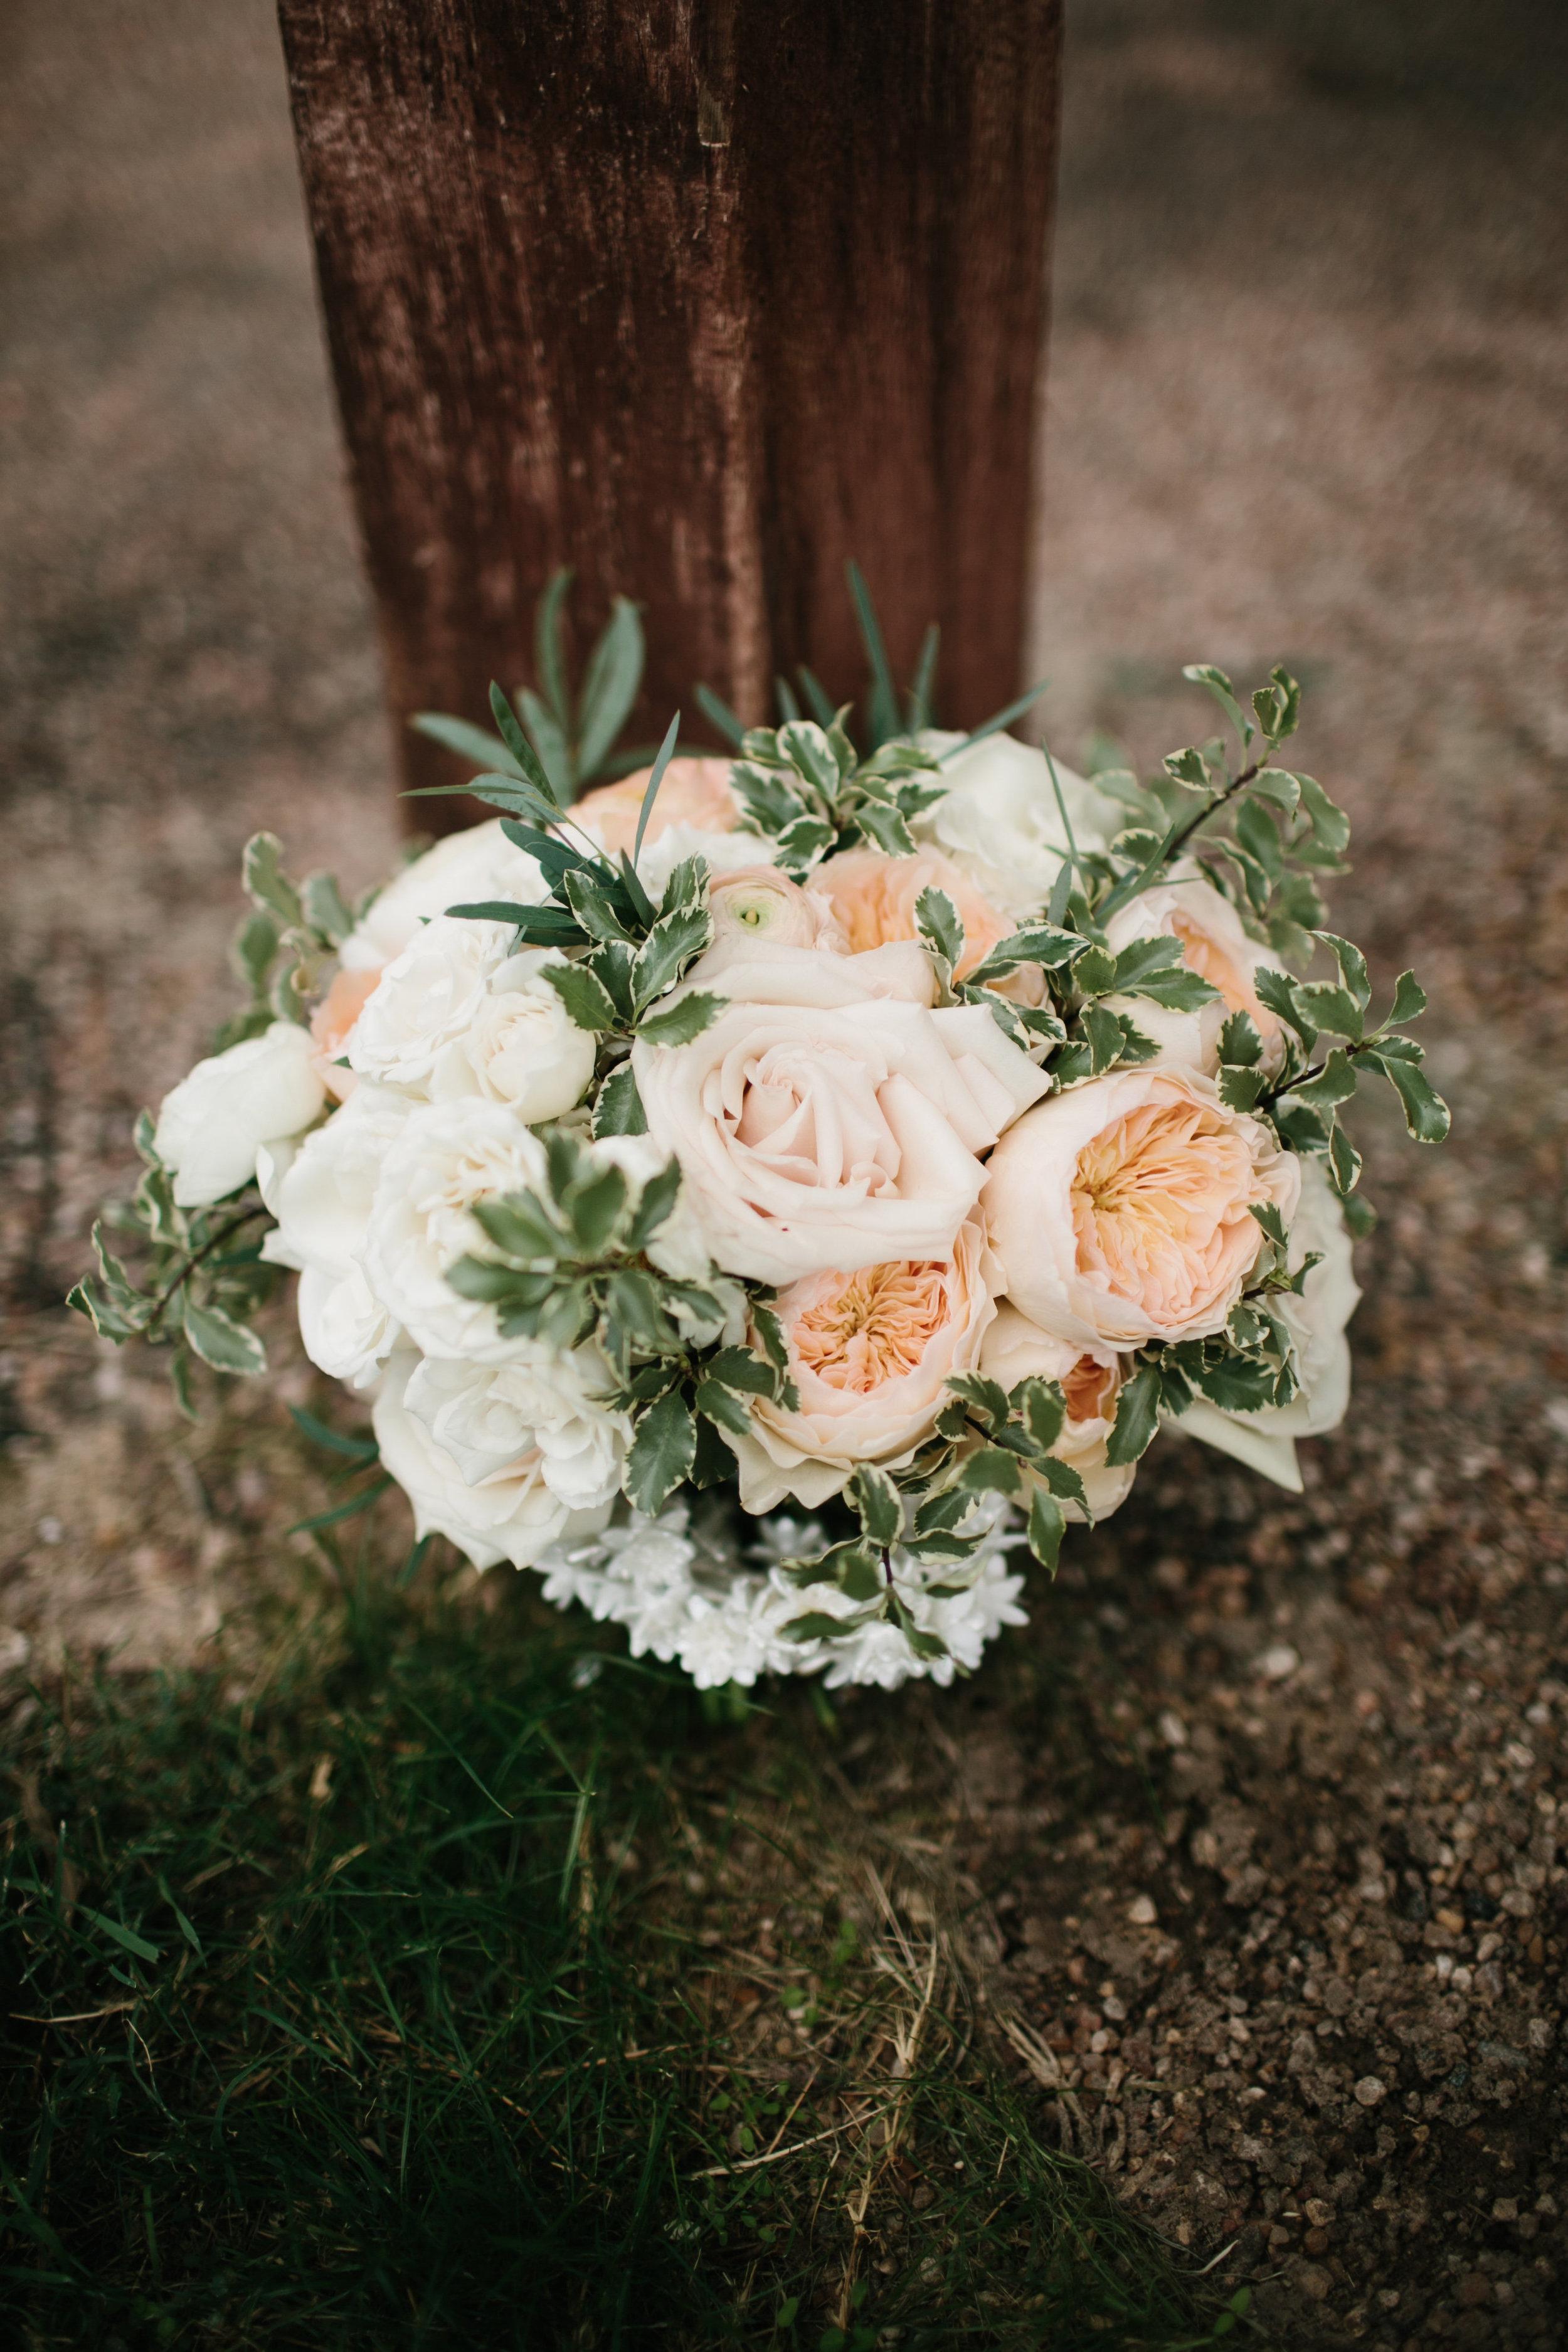 shannon_rose_rent_my_dust_fall_wedding_ (1).jpg